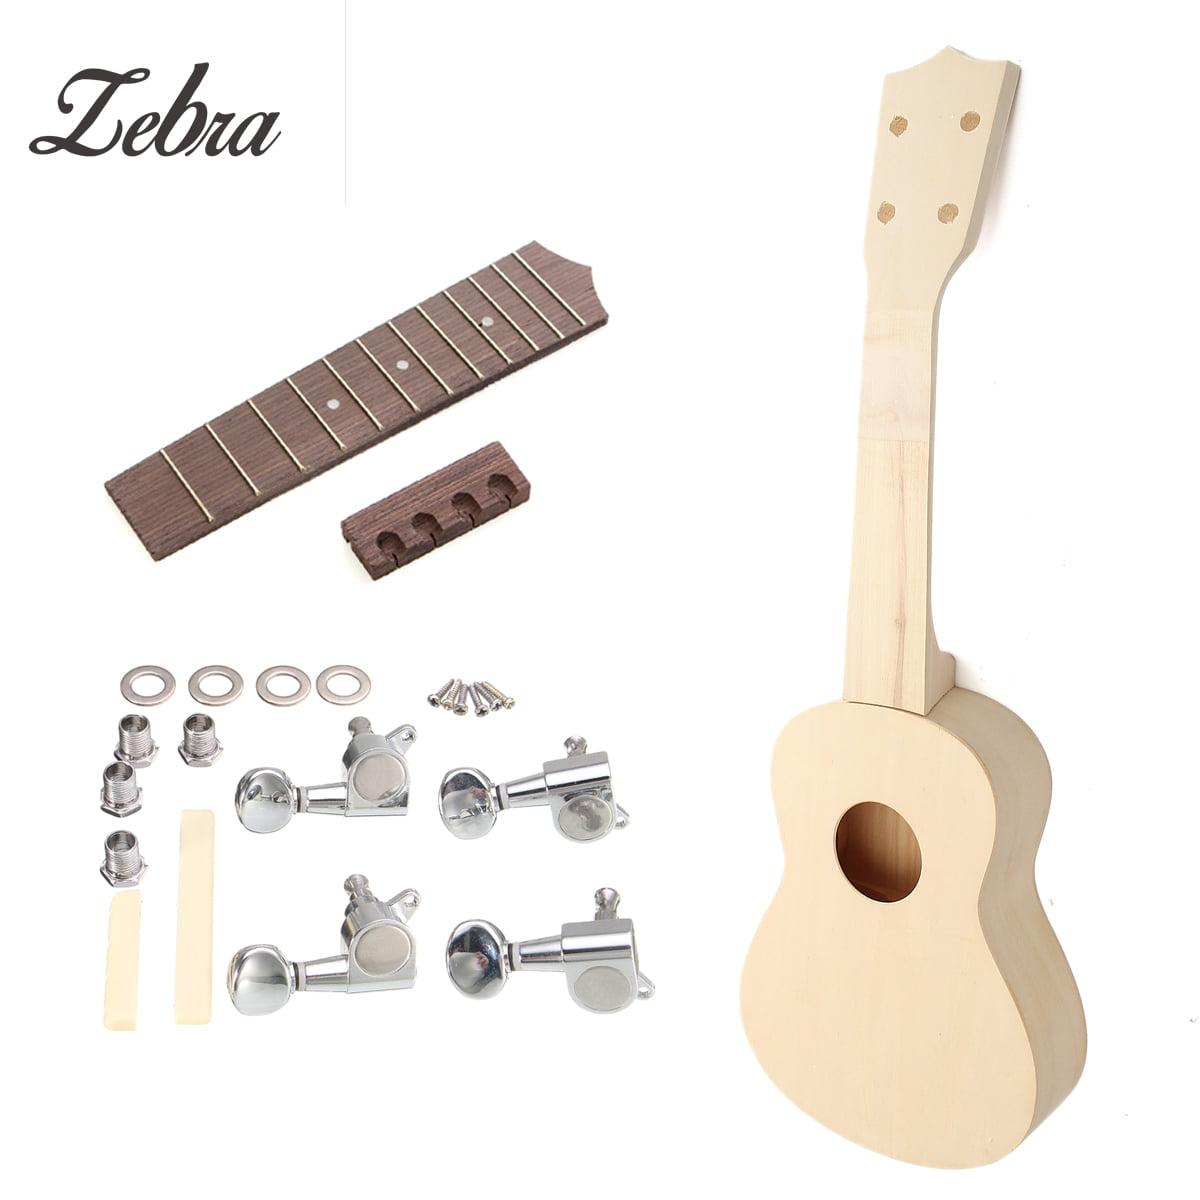 DIY 21'' Ukulele Soprano Wooden Musical Instruments Musical Instrument  Hawaiian Uke Guitar Kit Gift